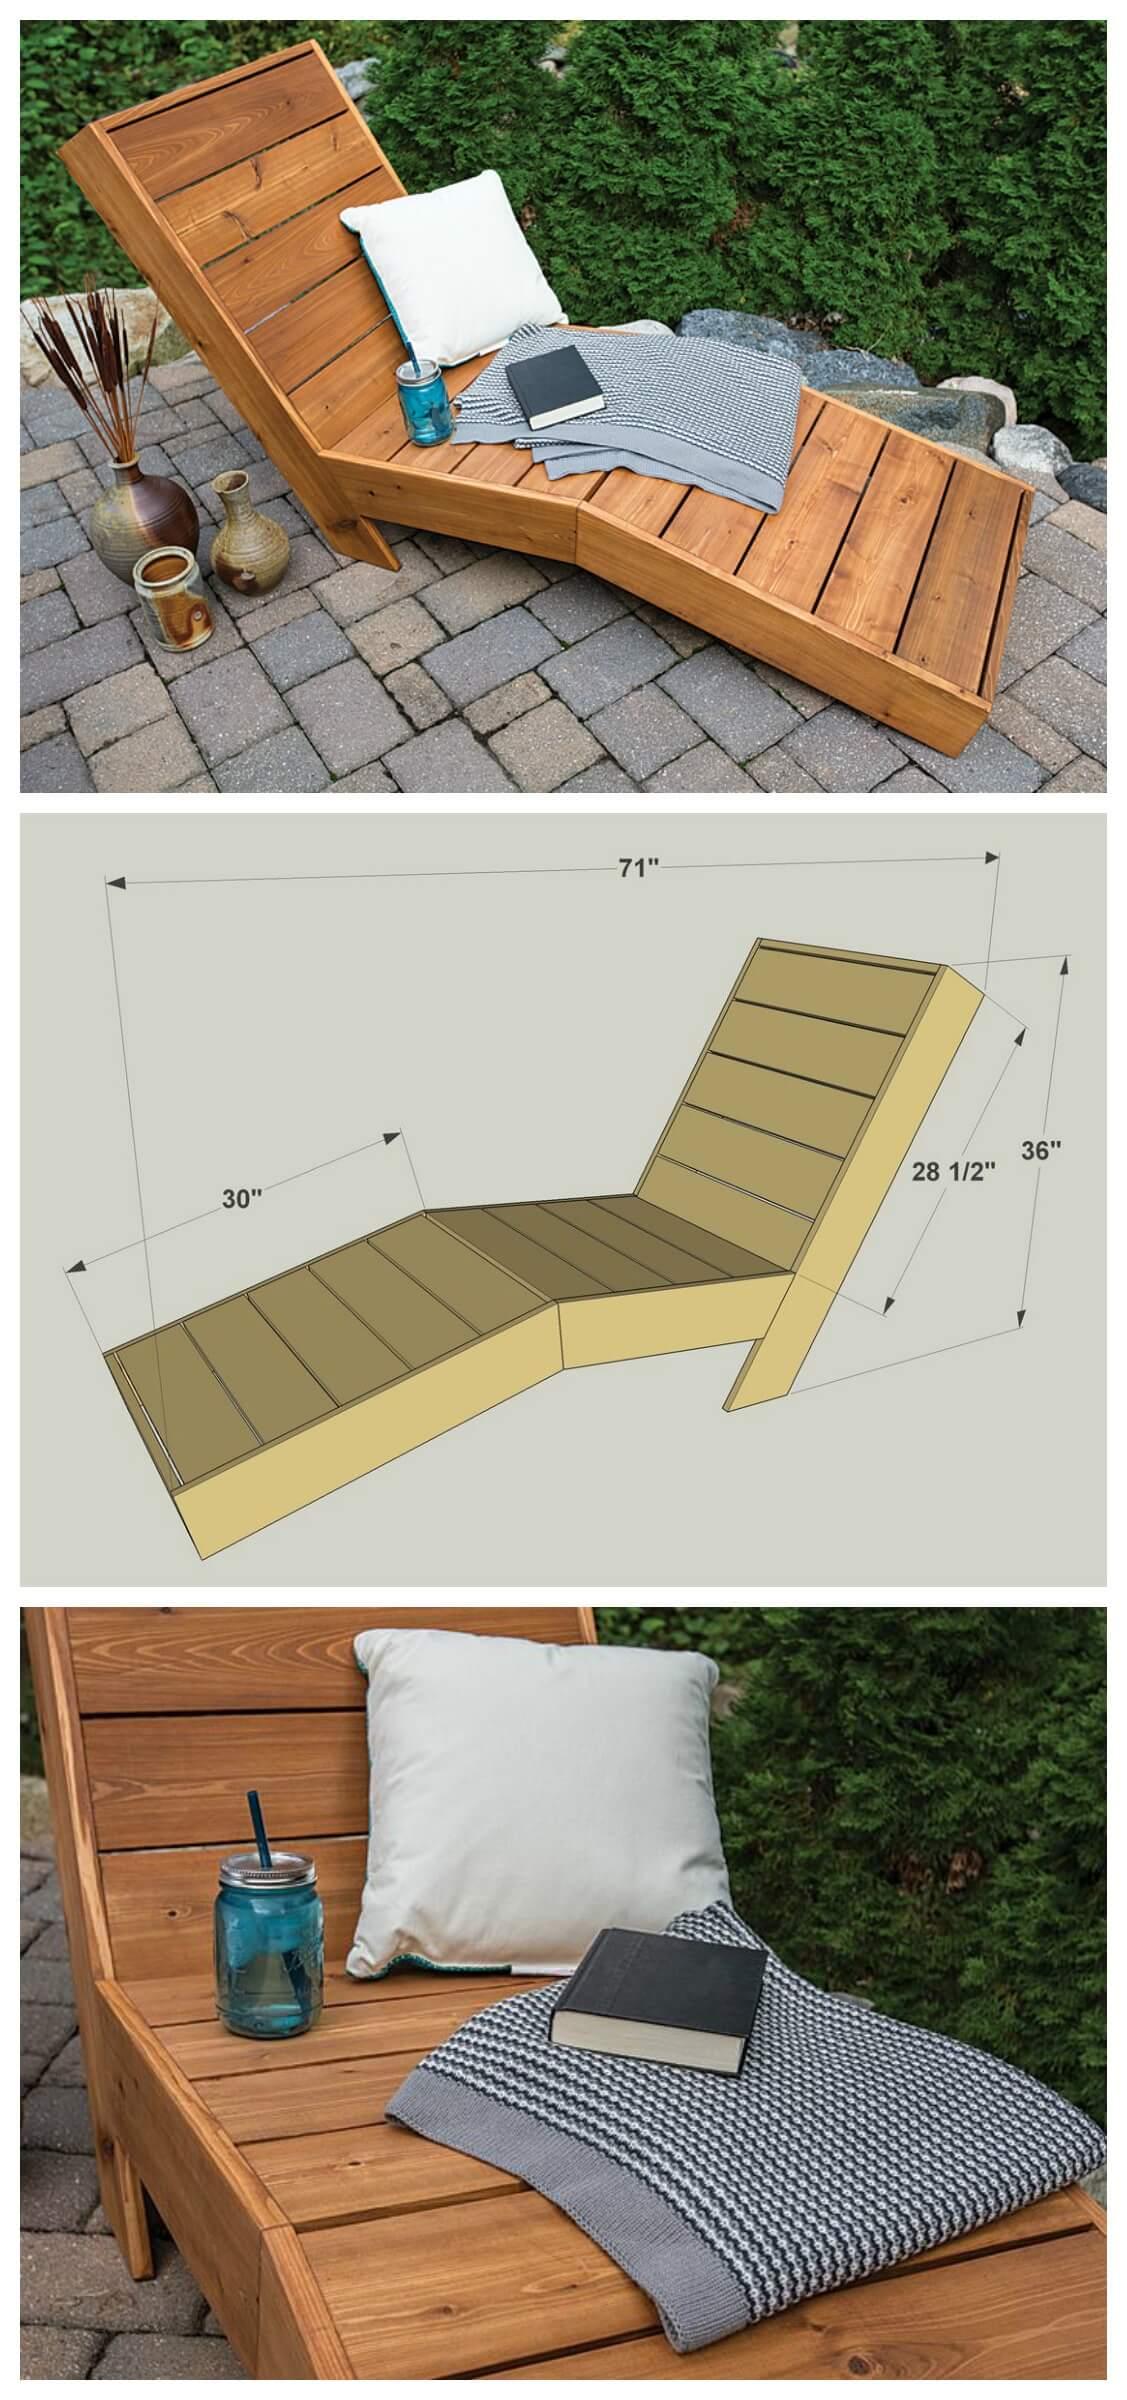 Summertime Wooden Cabana Lounge Chair